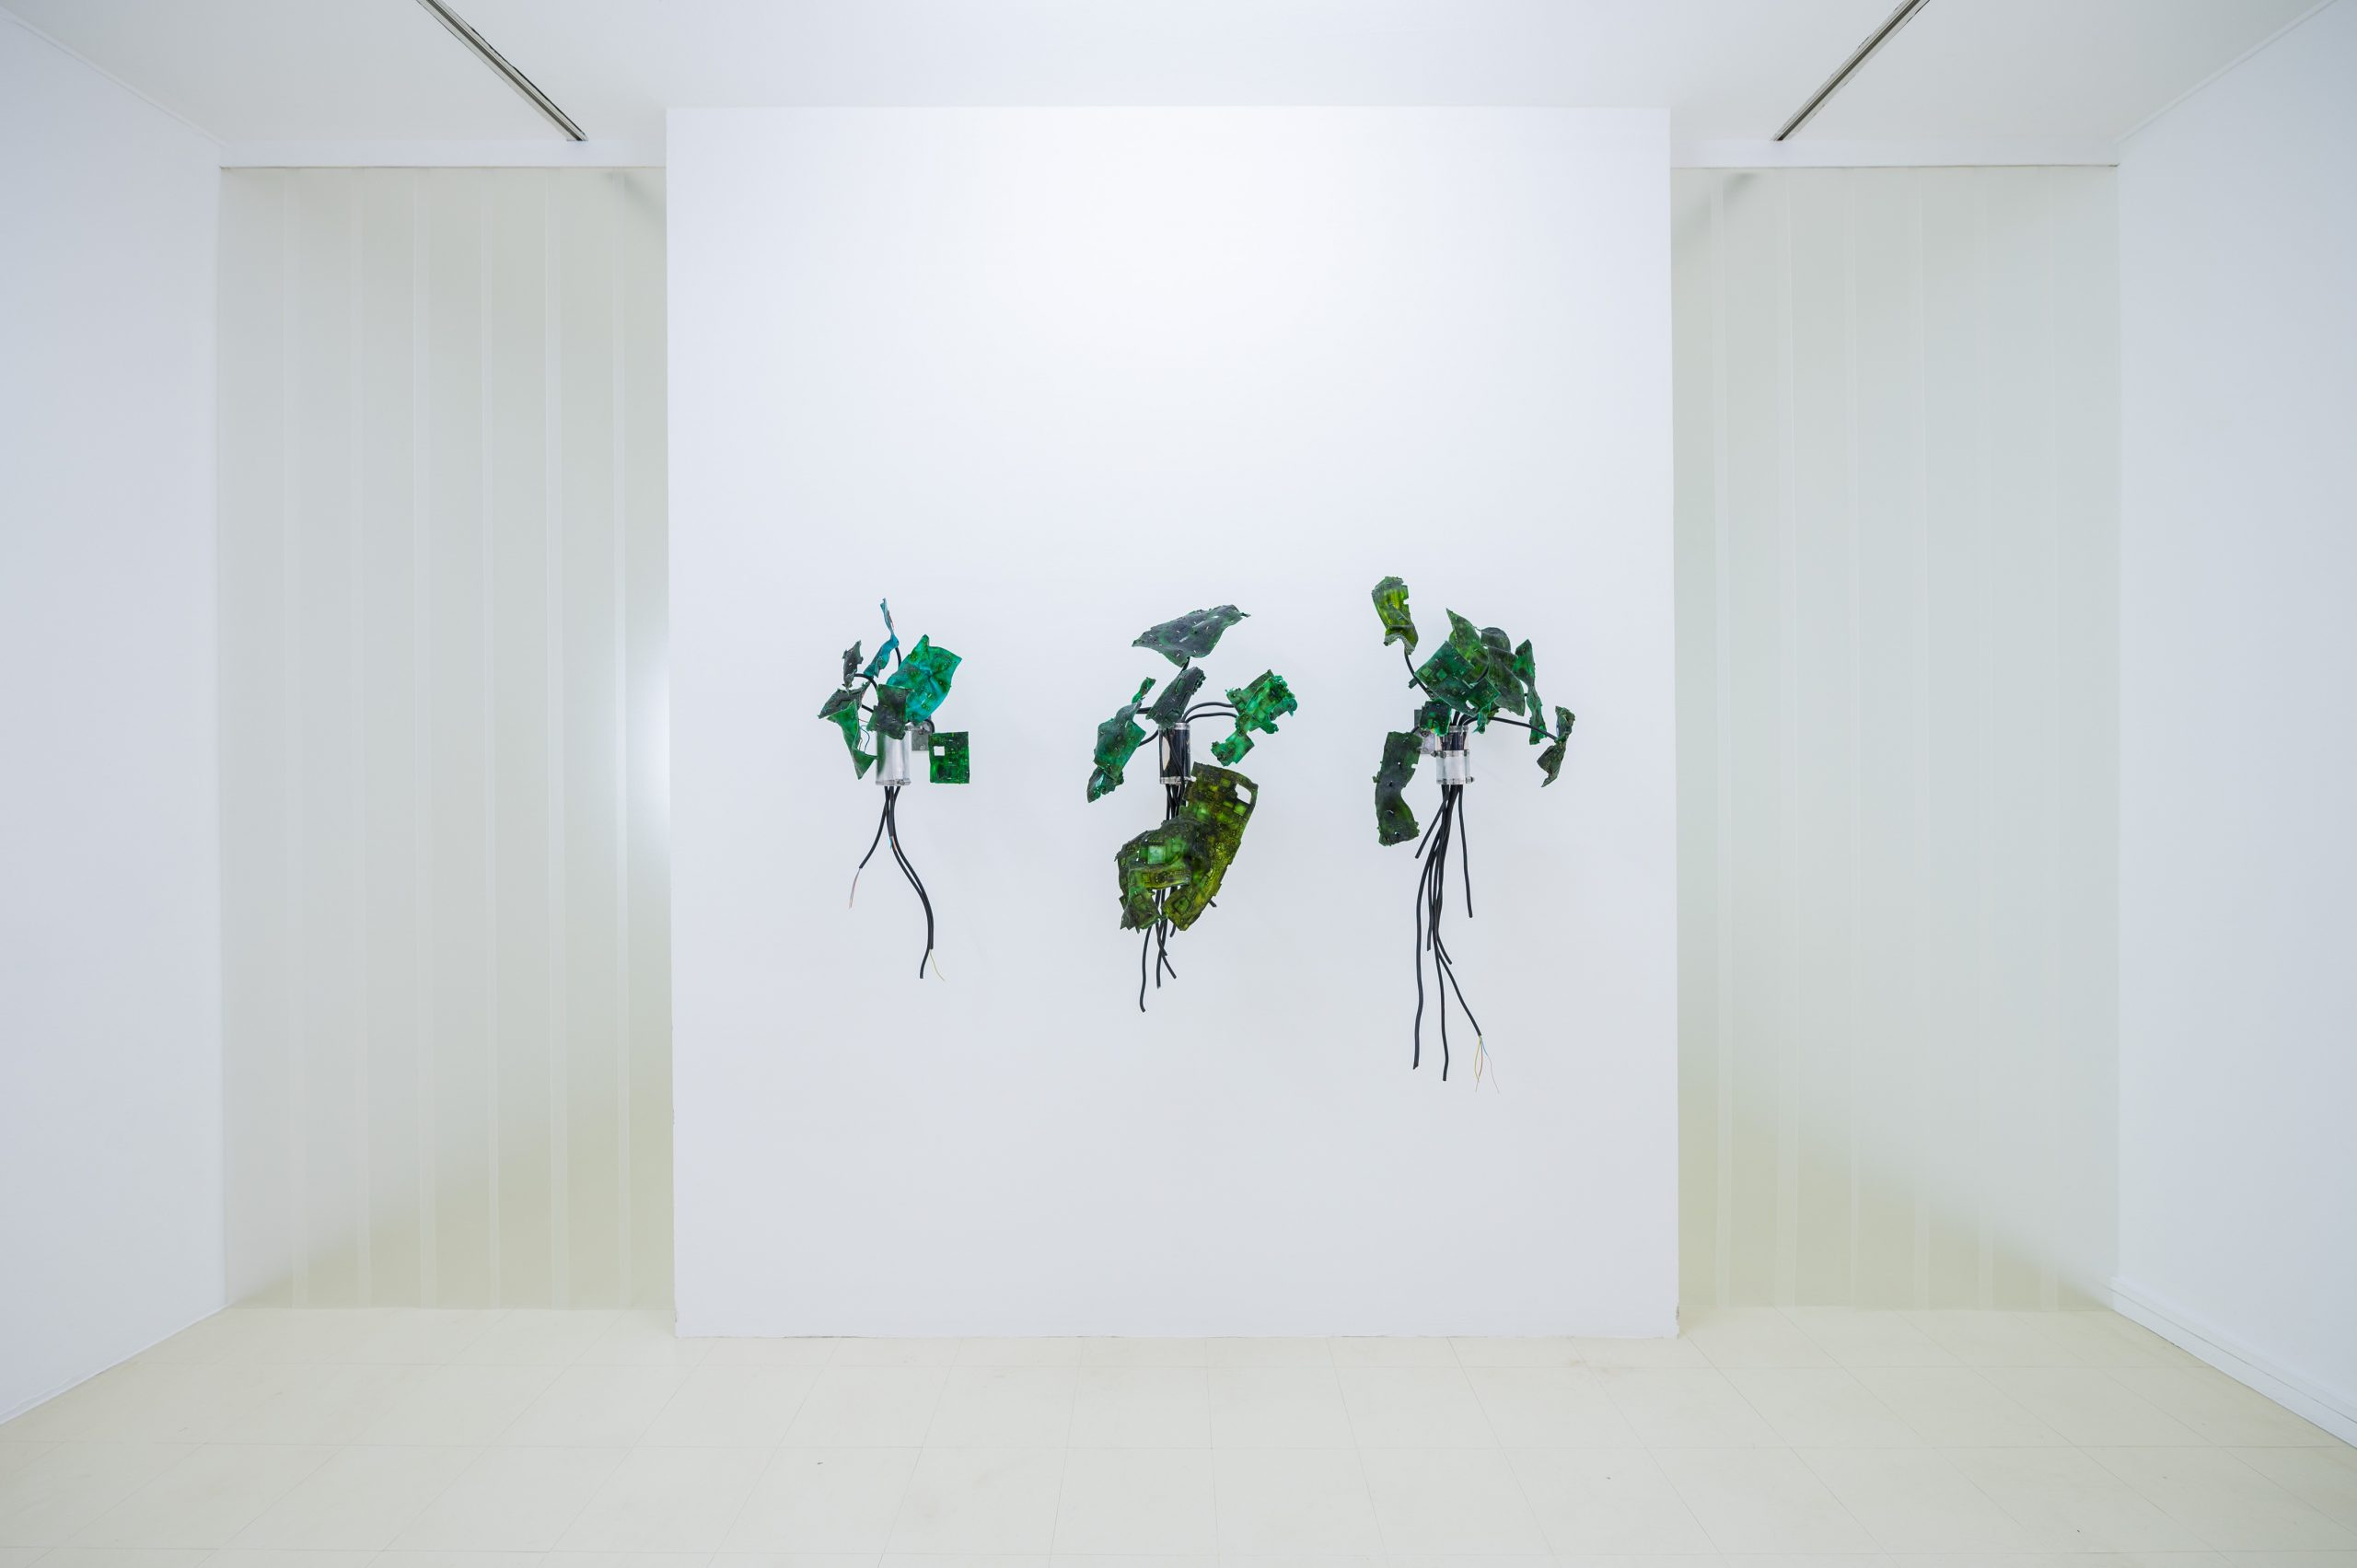 Gillian Brett, Bionic Leaf, 2021, Detail Ausstellung Stadtgalerie Saarbrücken, Foto: Oliver Dietze